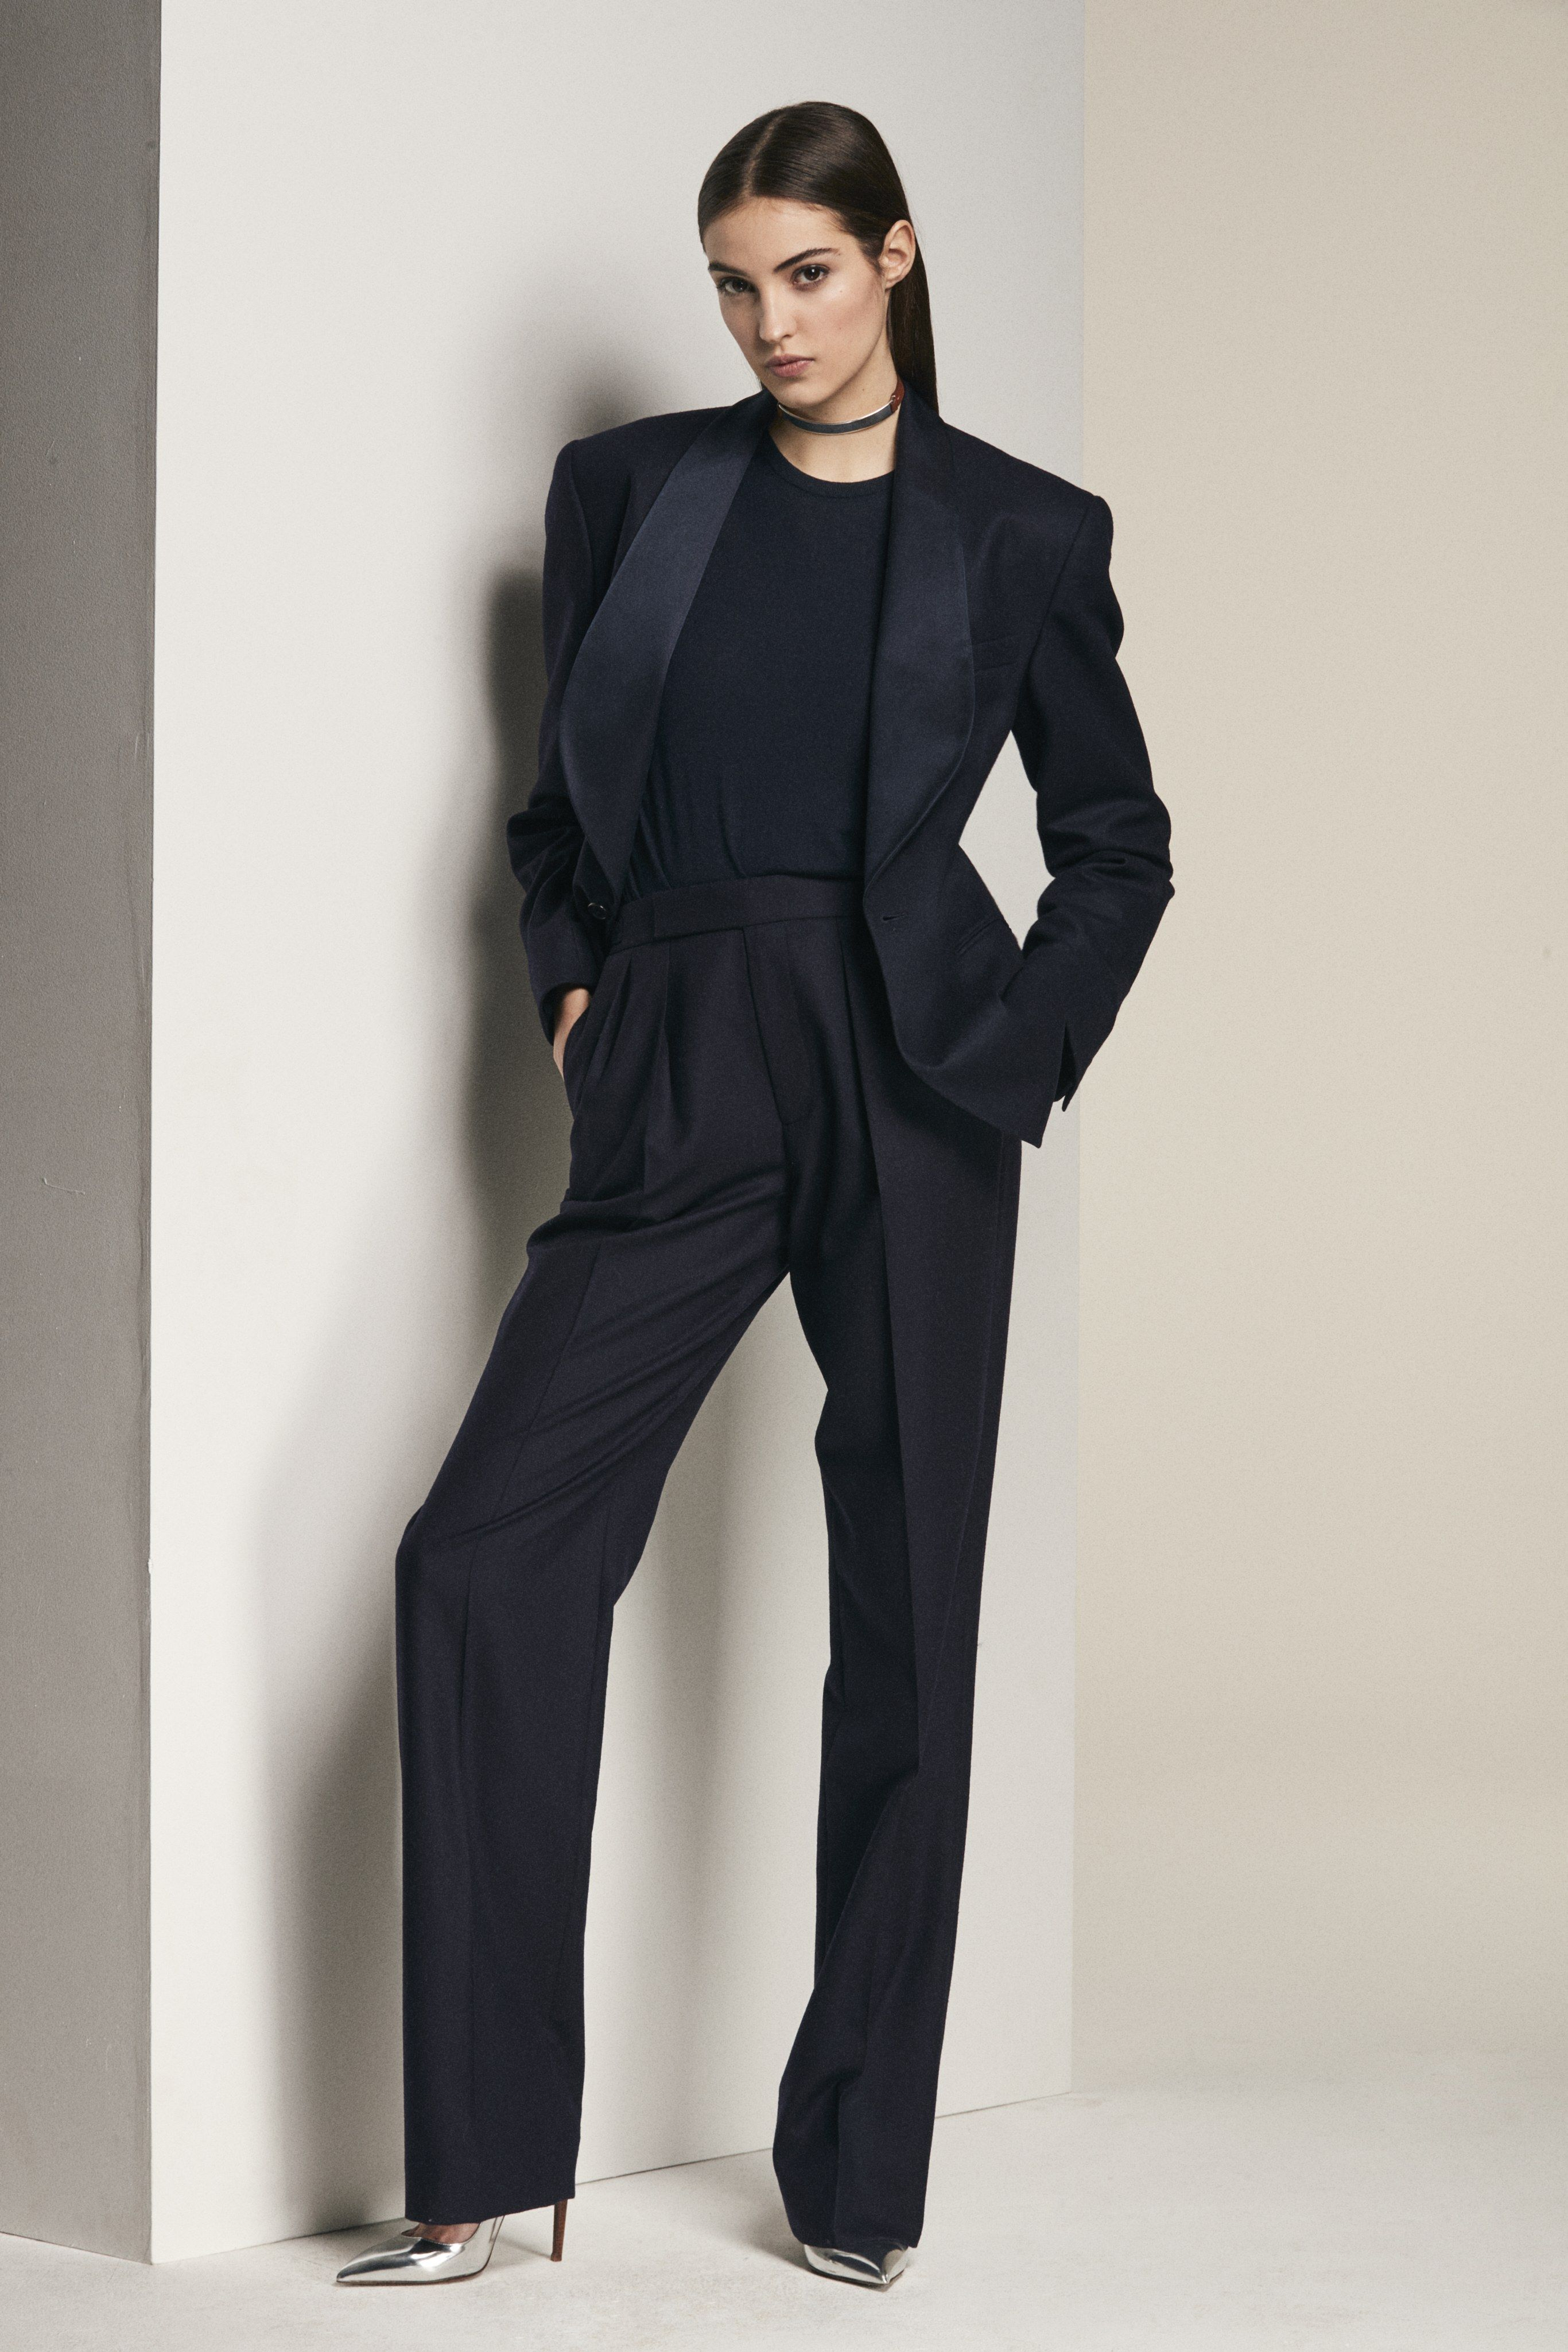 Ralph Lauren Pre-Fall 2018 Fashion Show   Pinterest   Tailleur ... 8d4185e1c74